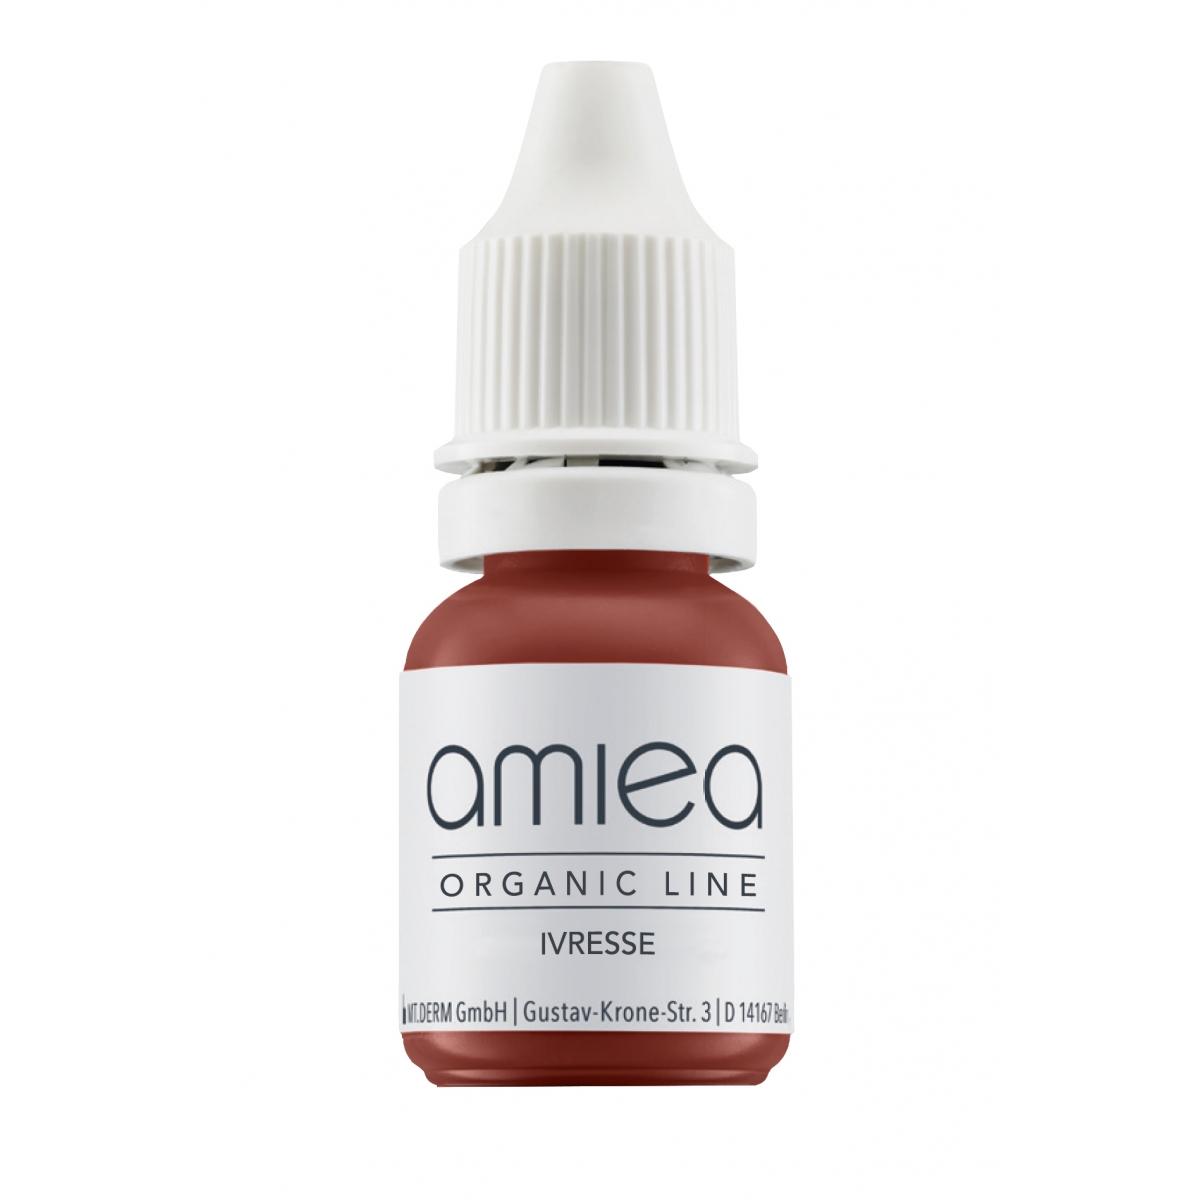 Organicline (10 ml) - PIGMENTS AMIEA ORGANICLINE IVRESSE, Flacon 10 ml